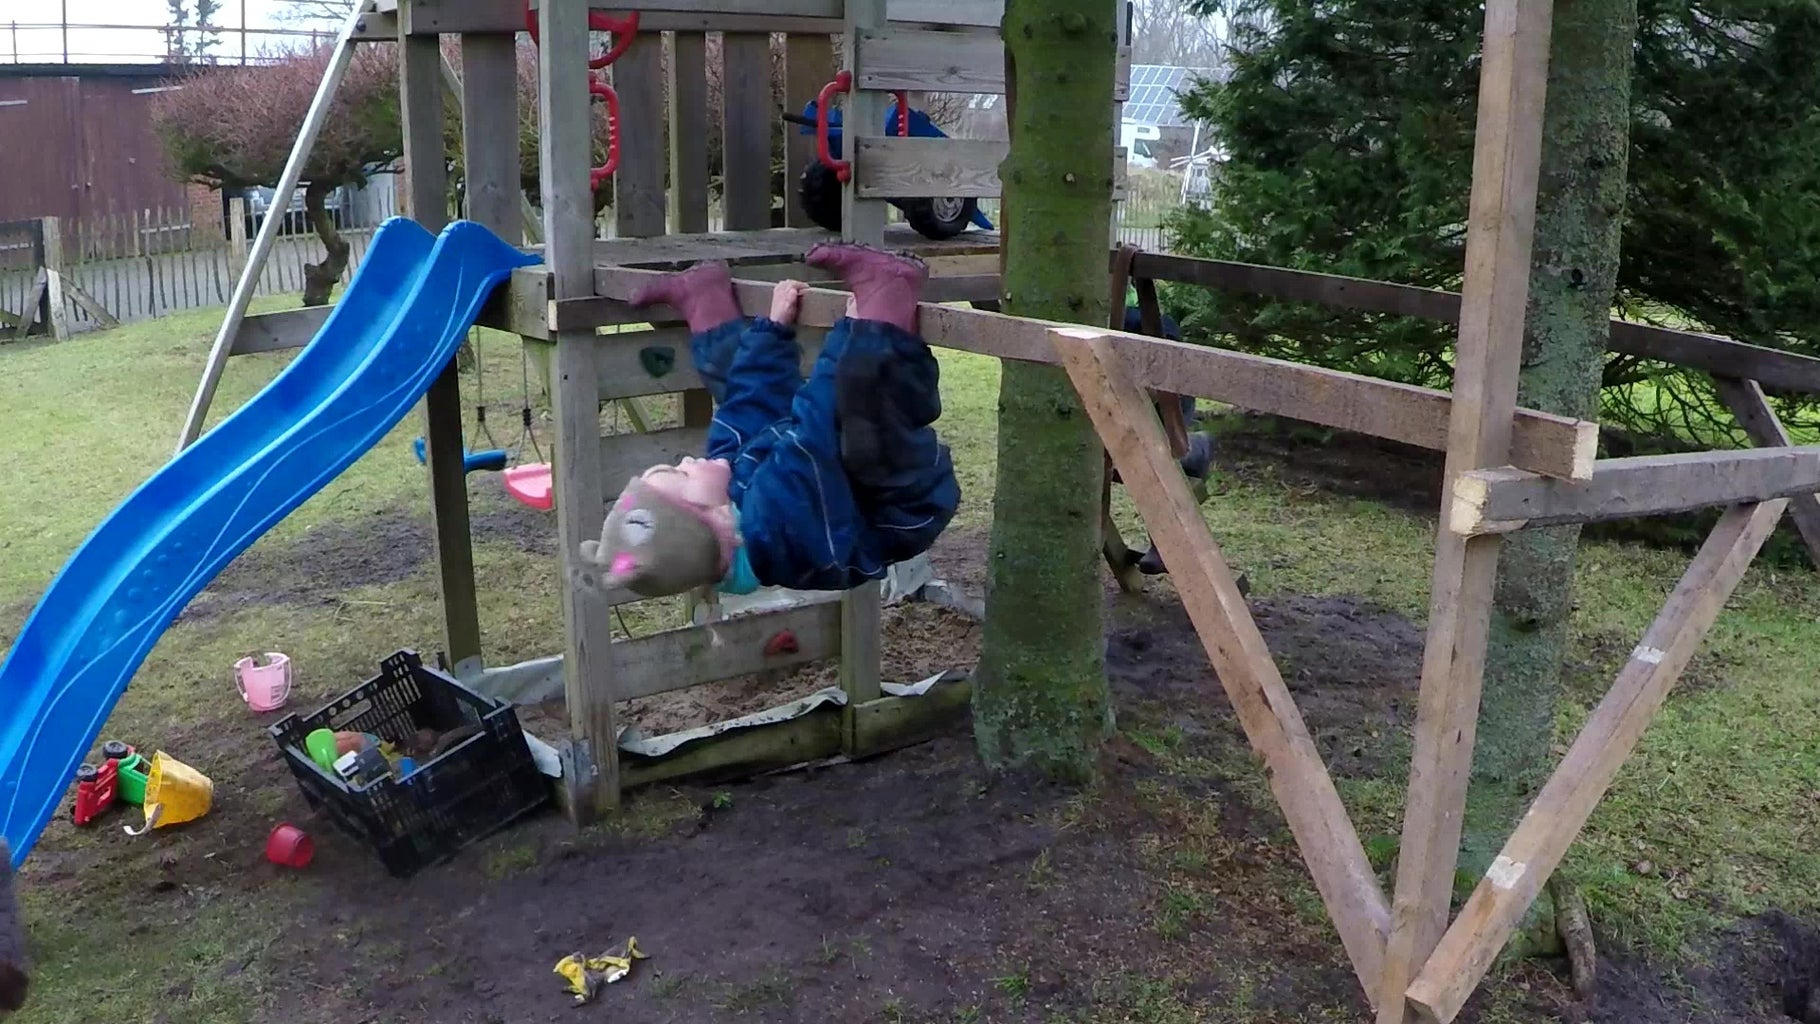 Building the Start-Platform / Playhouse